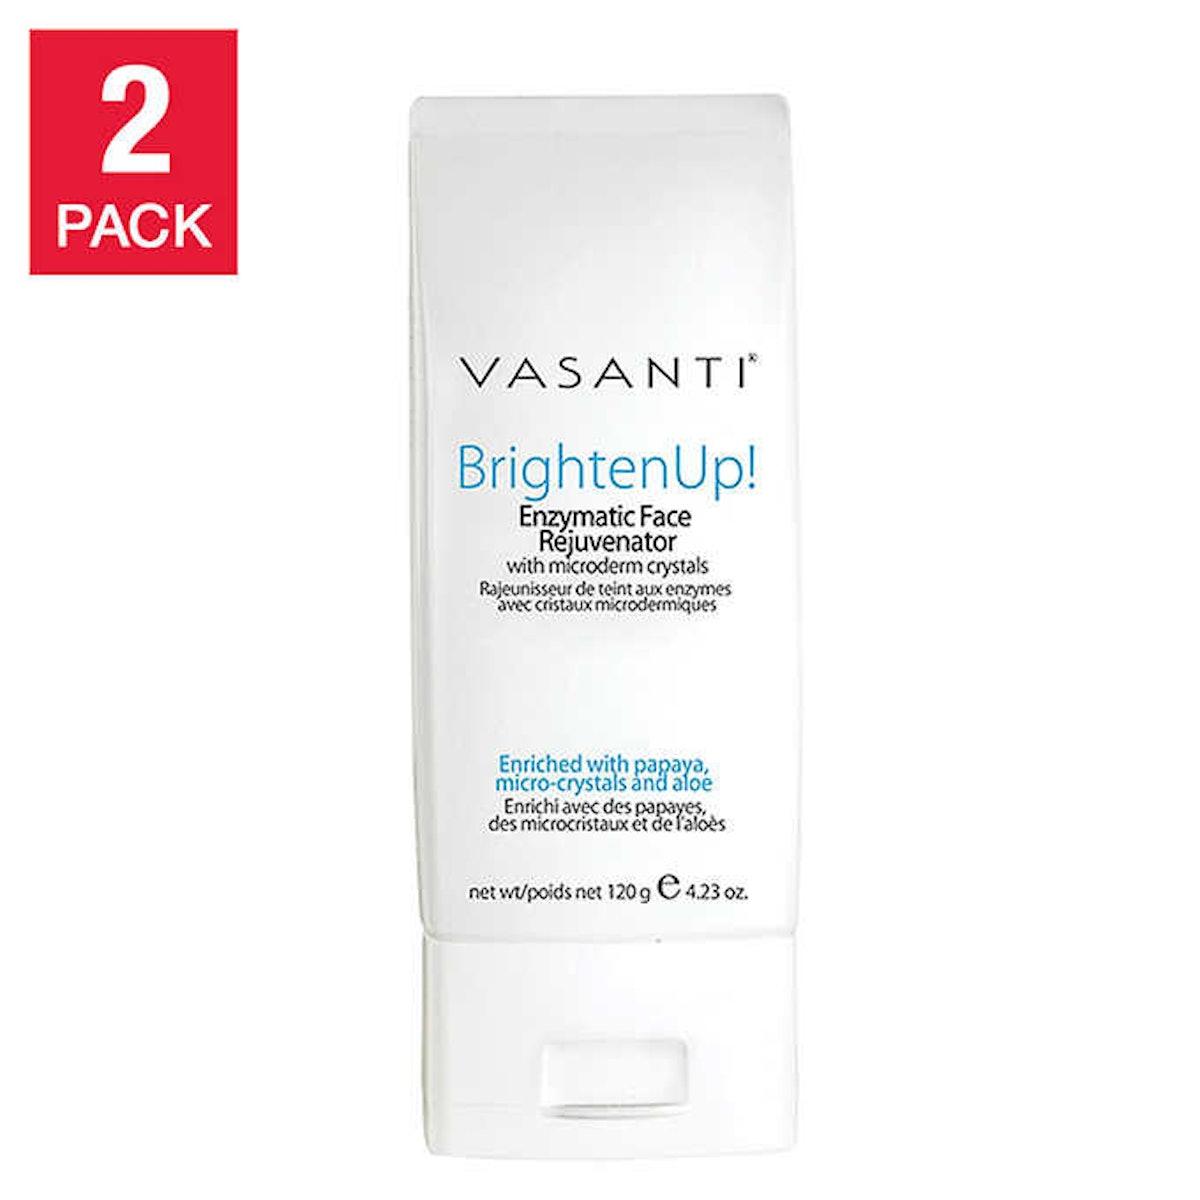 Vasanti Brighten Up! Enzymatic Face Rejuvenator Cleanser